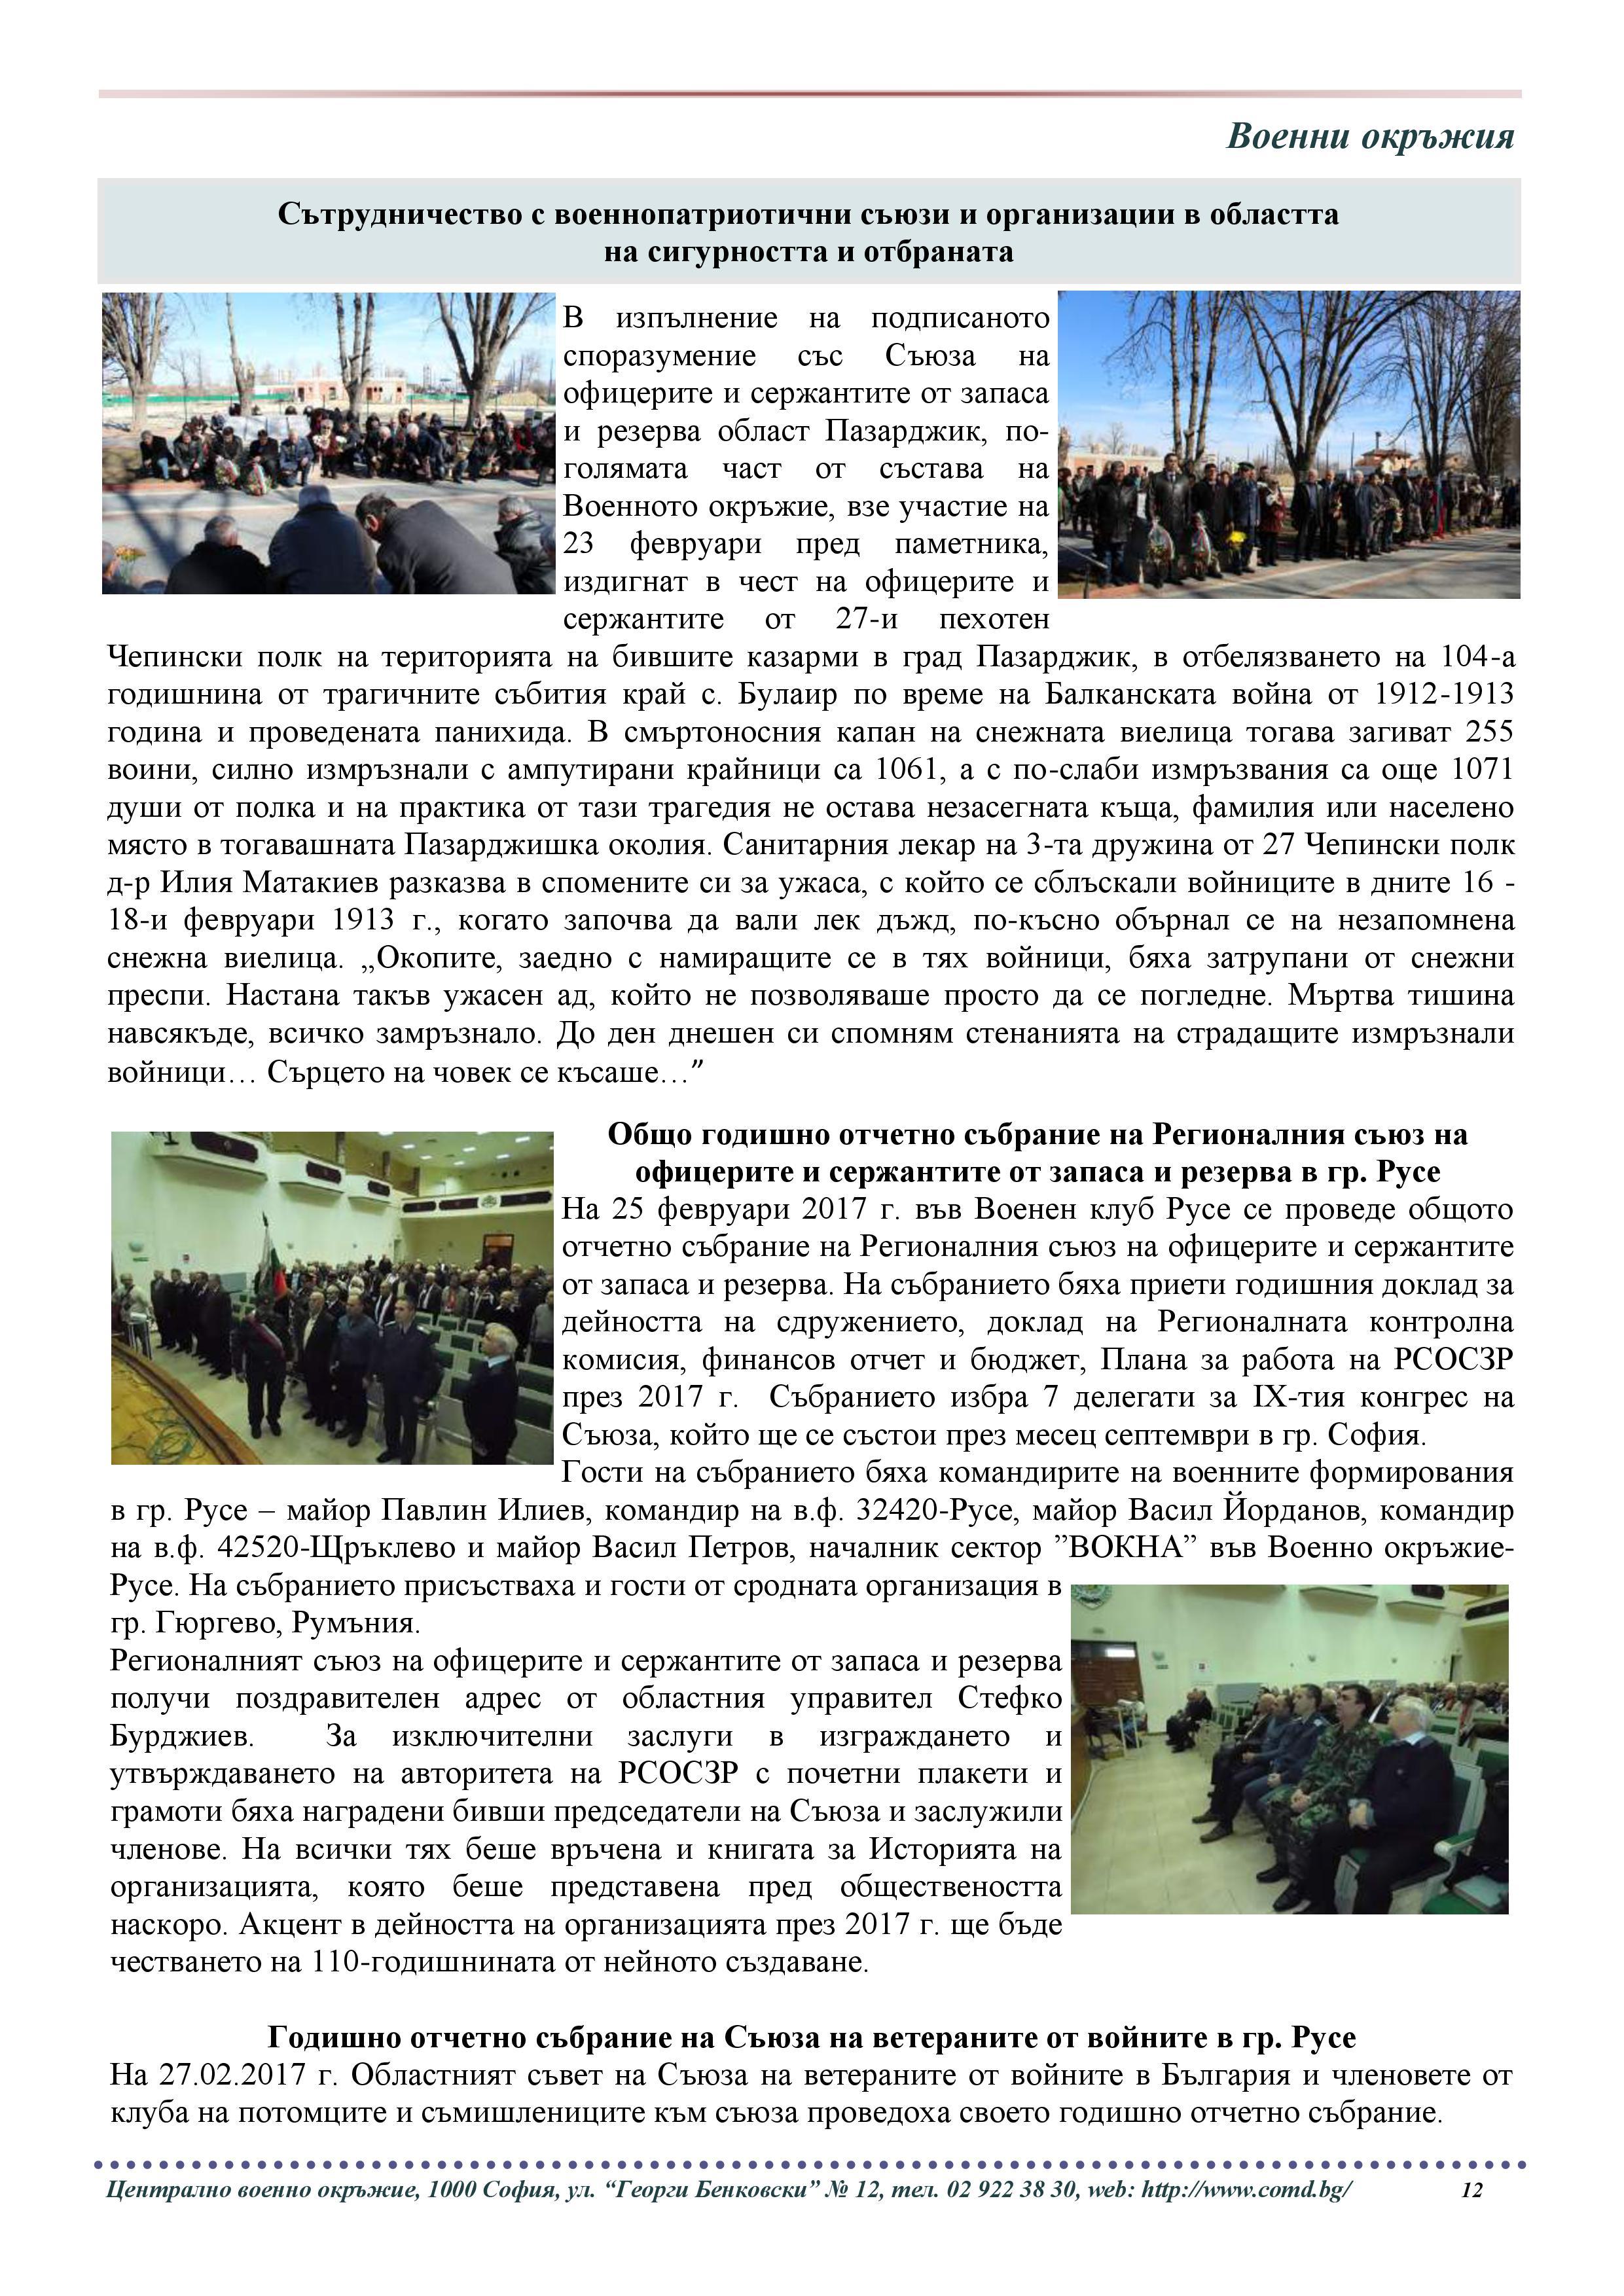 http://armymedia.bg/wp-content/uploads/2015/06/IB_2_2017g.compressed-za-izpra6tane-22.03.2017.page12.jpg